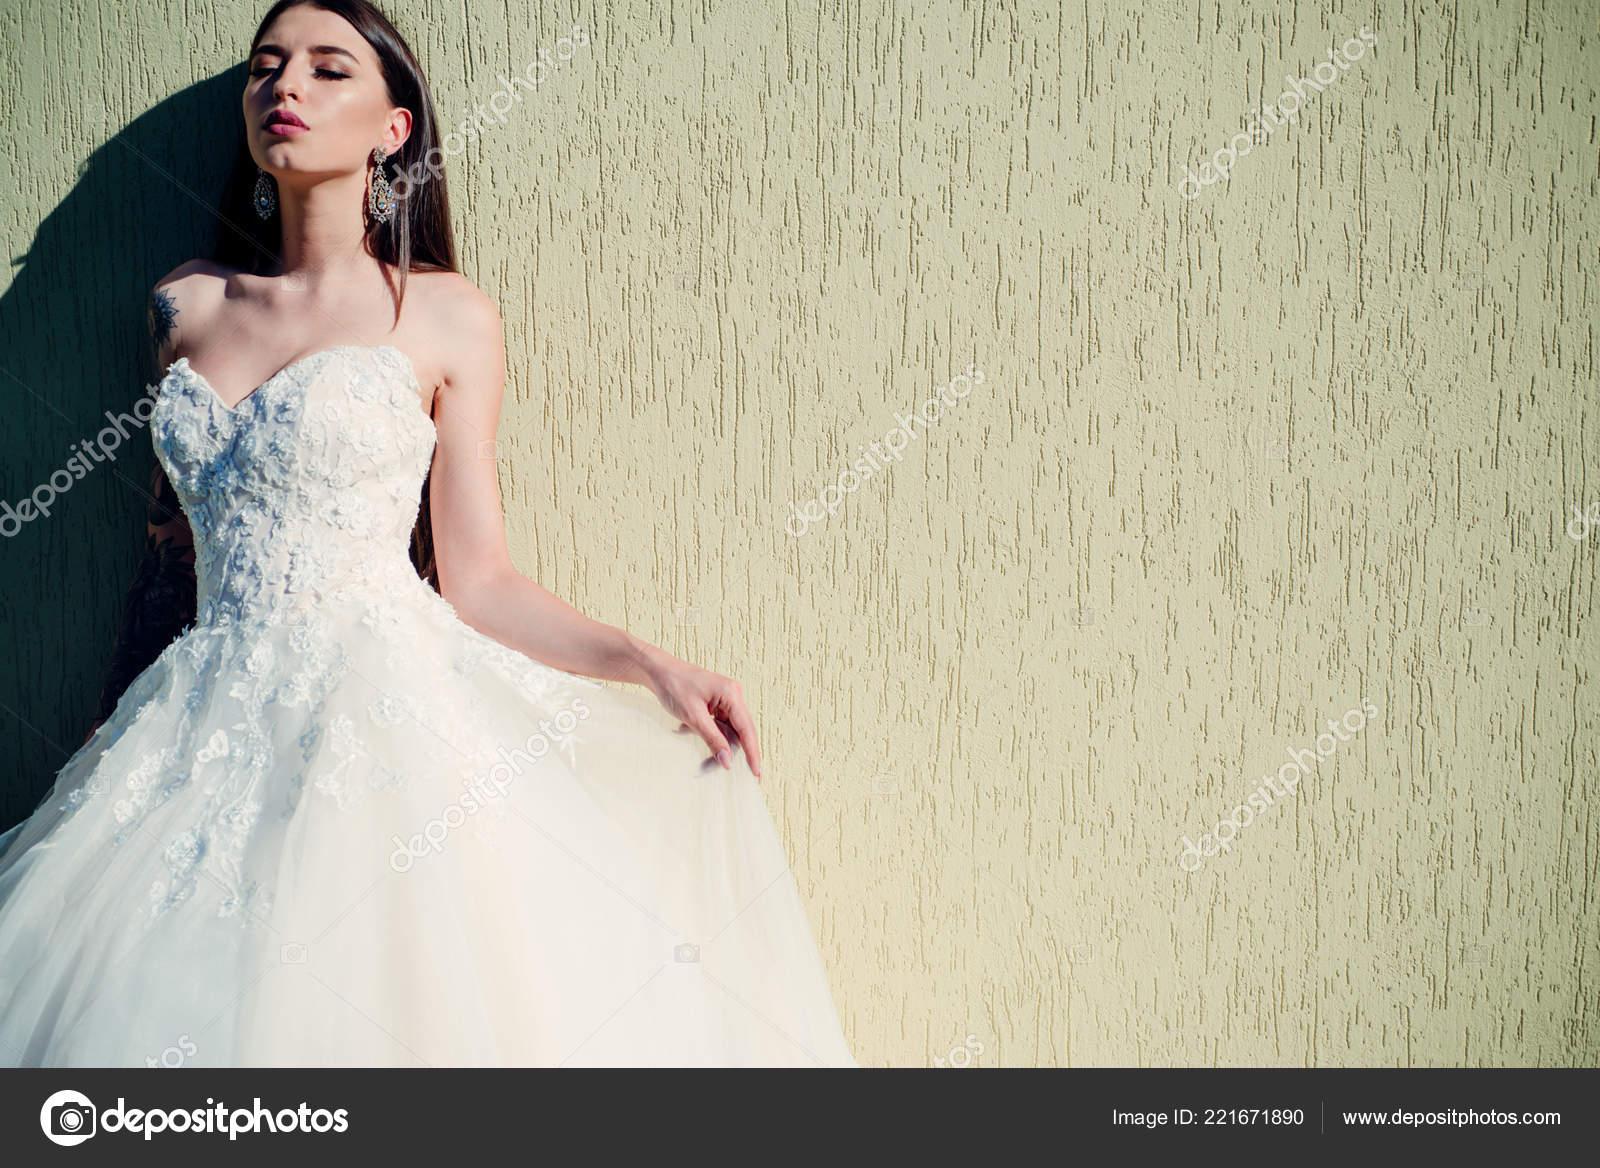 b788d1b6b0 Vestidos de boda hermosa en boutique. Maravilloso vestido de novia. mujer  se está preparando para la boda. Salon de boda elegante espera para novia